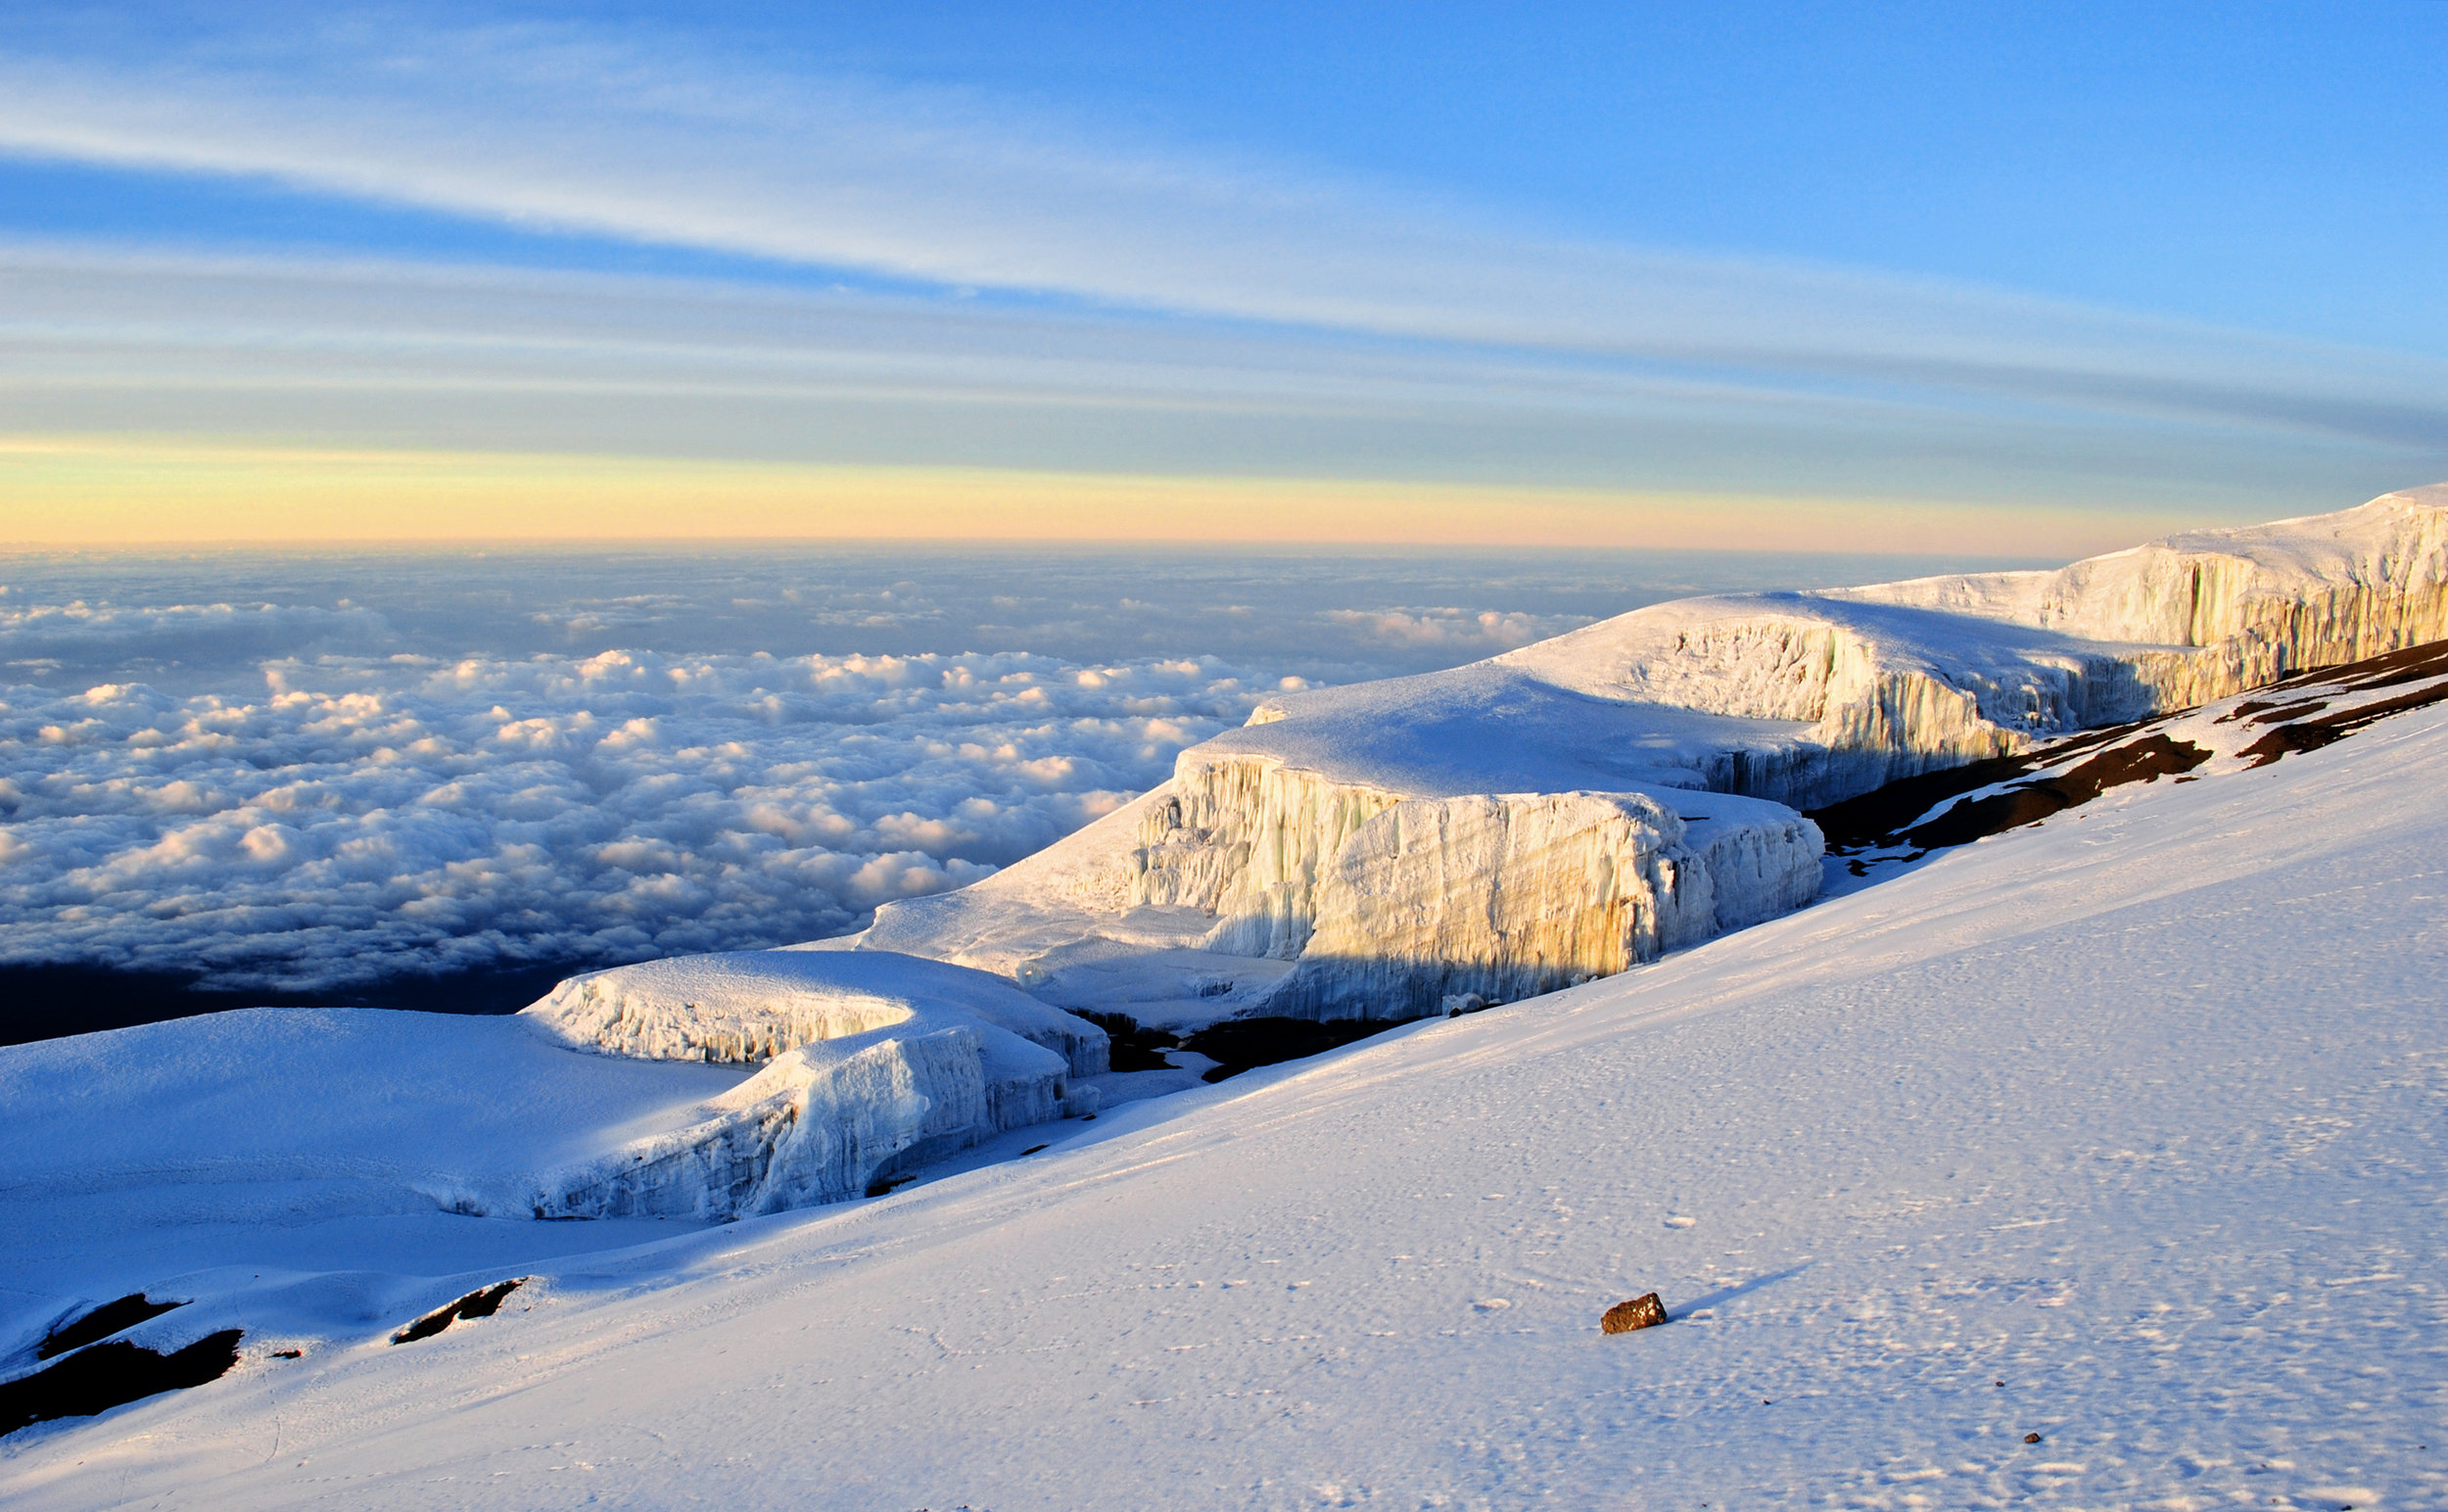 22 The Snows of Kilimanjaro.jpg